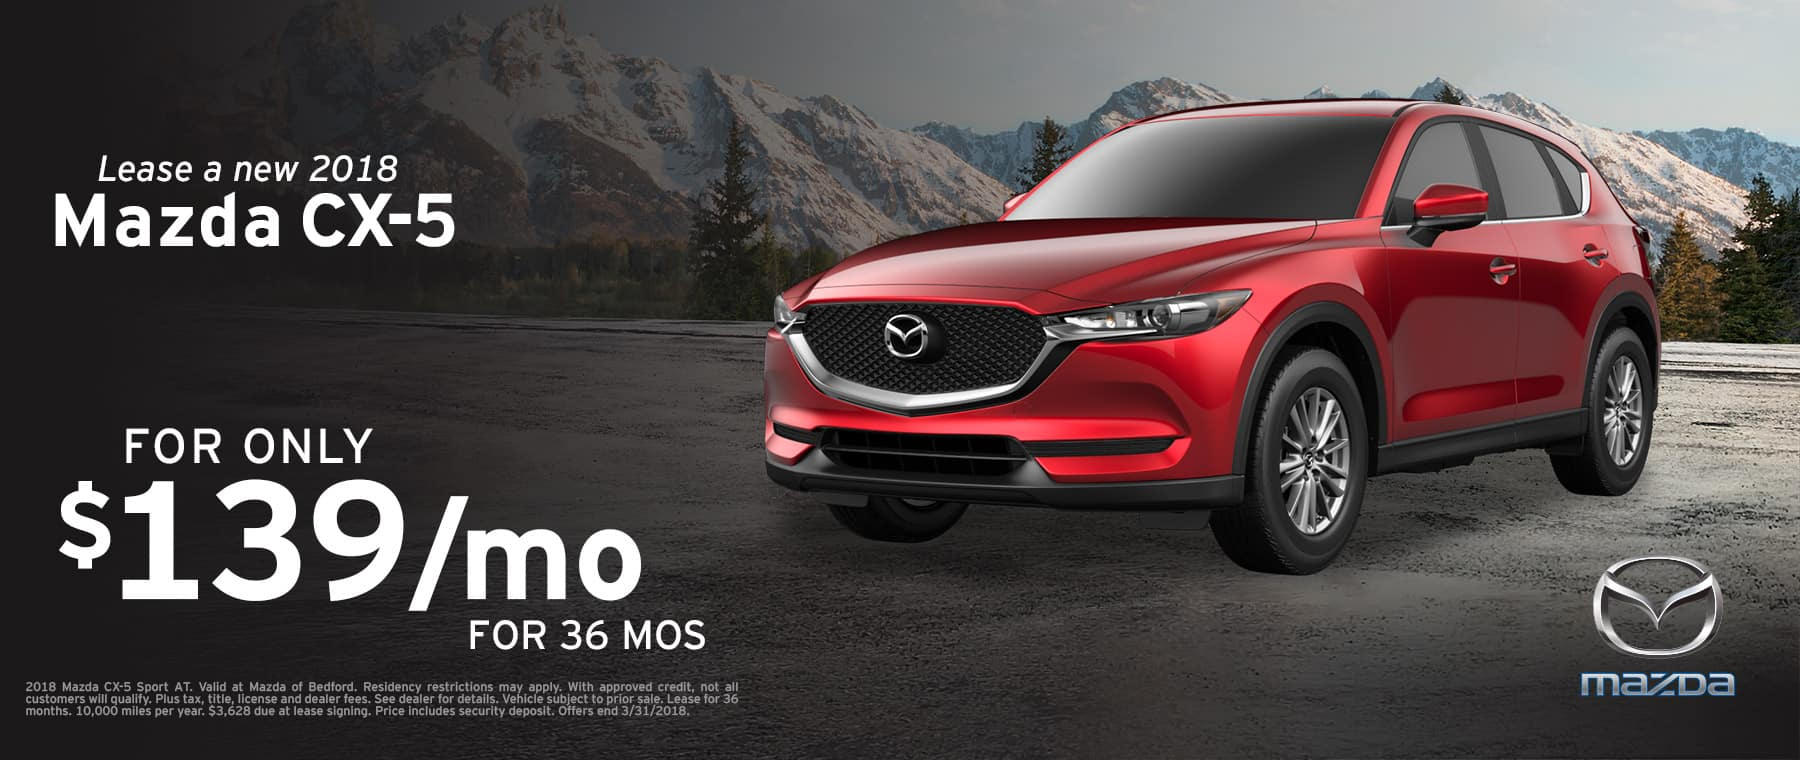 2018 Mazda CX-5 Special